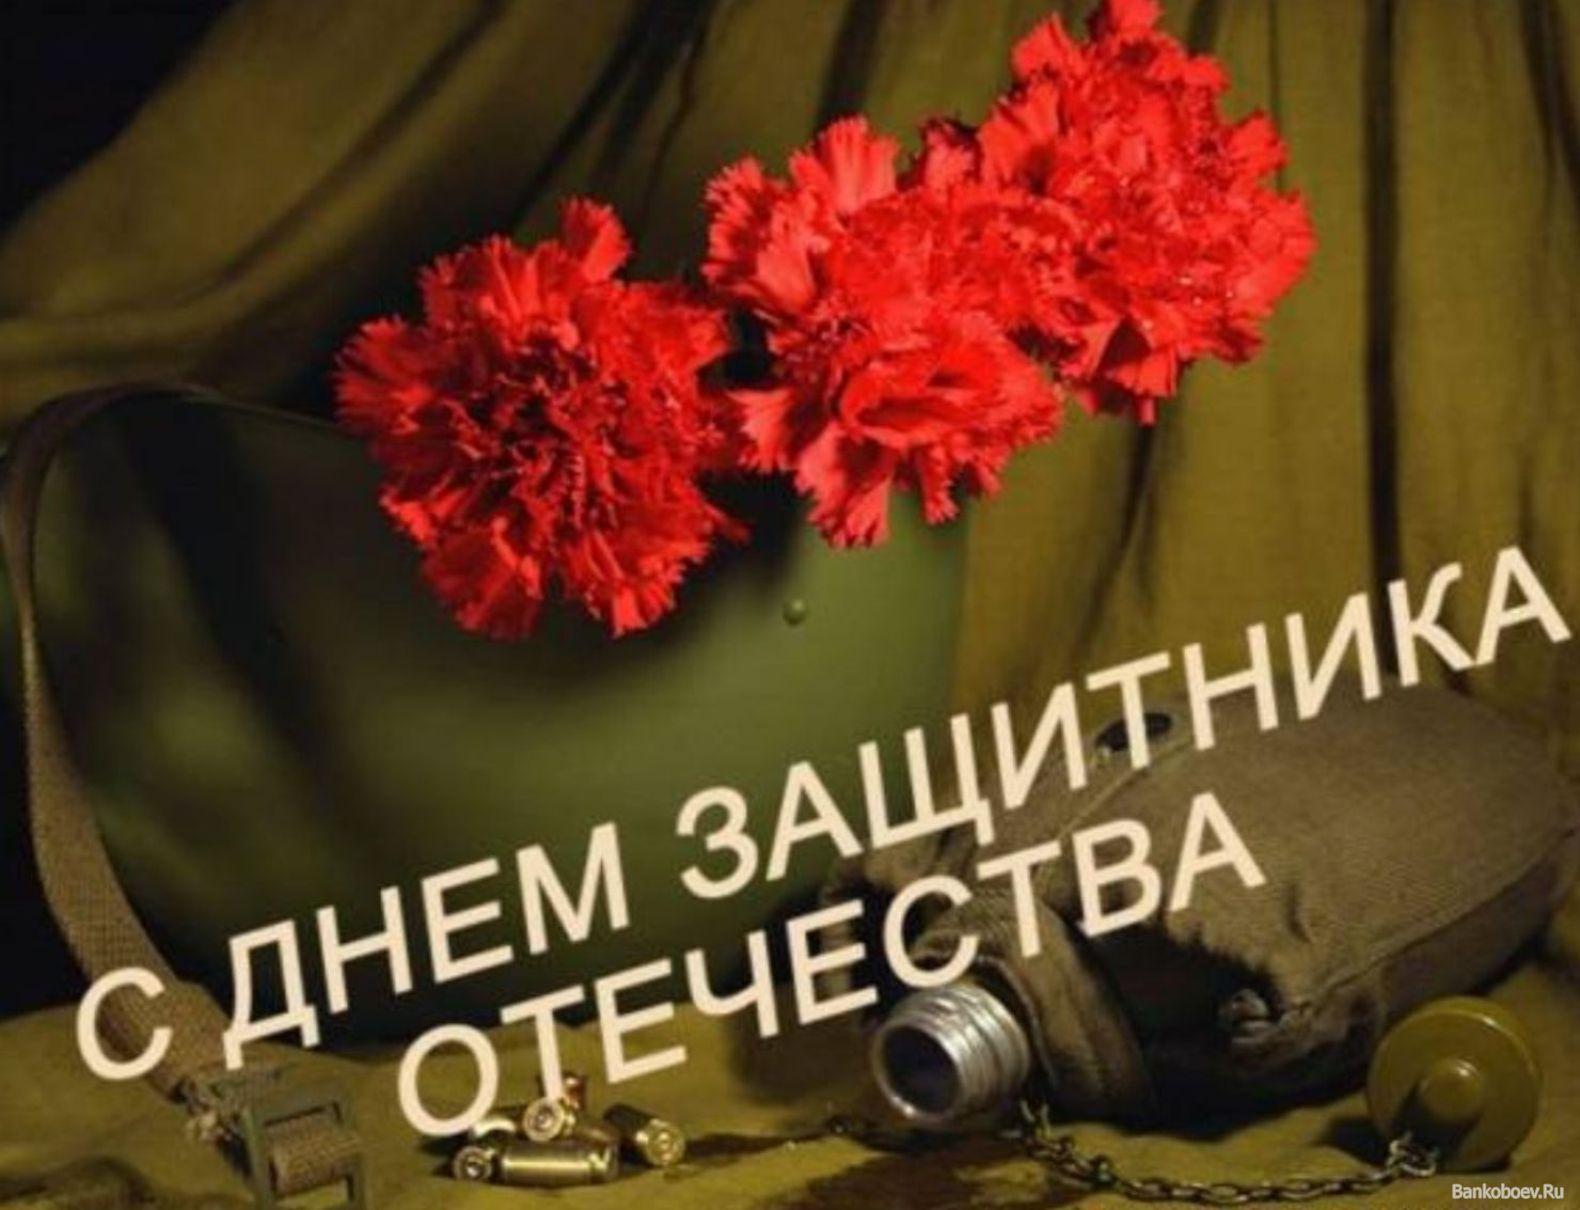 Поздравления с днем защитника отечества мужчине от мужчины